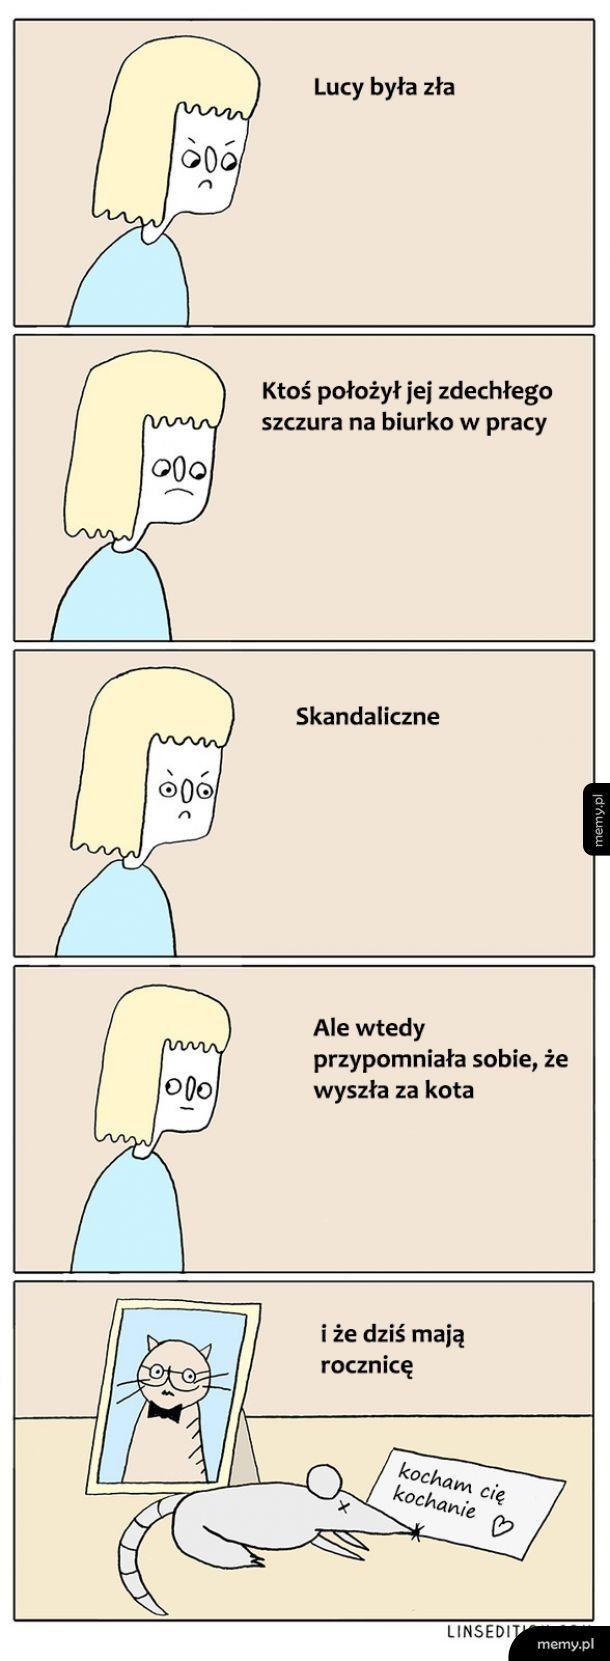 Memy Rocznica Rocznica Memy Rocznica Memy Pl